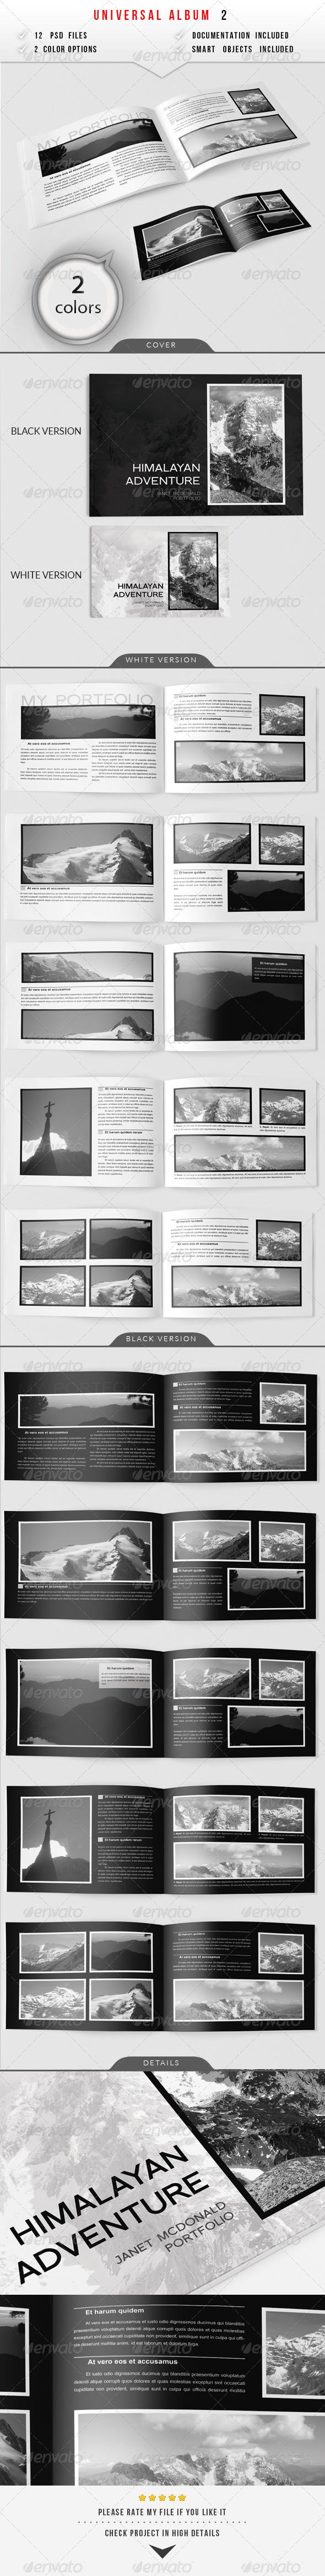 Universal Album 2 - Photo Albums Print Templates